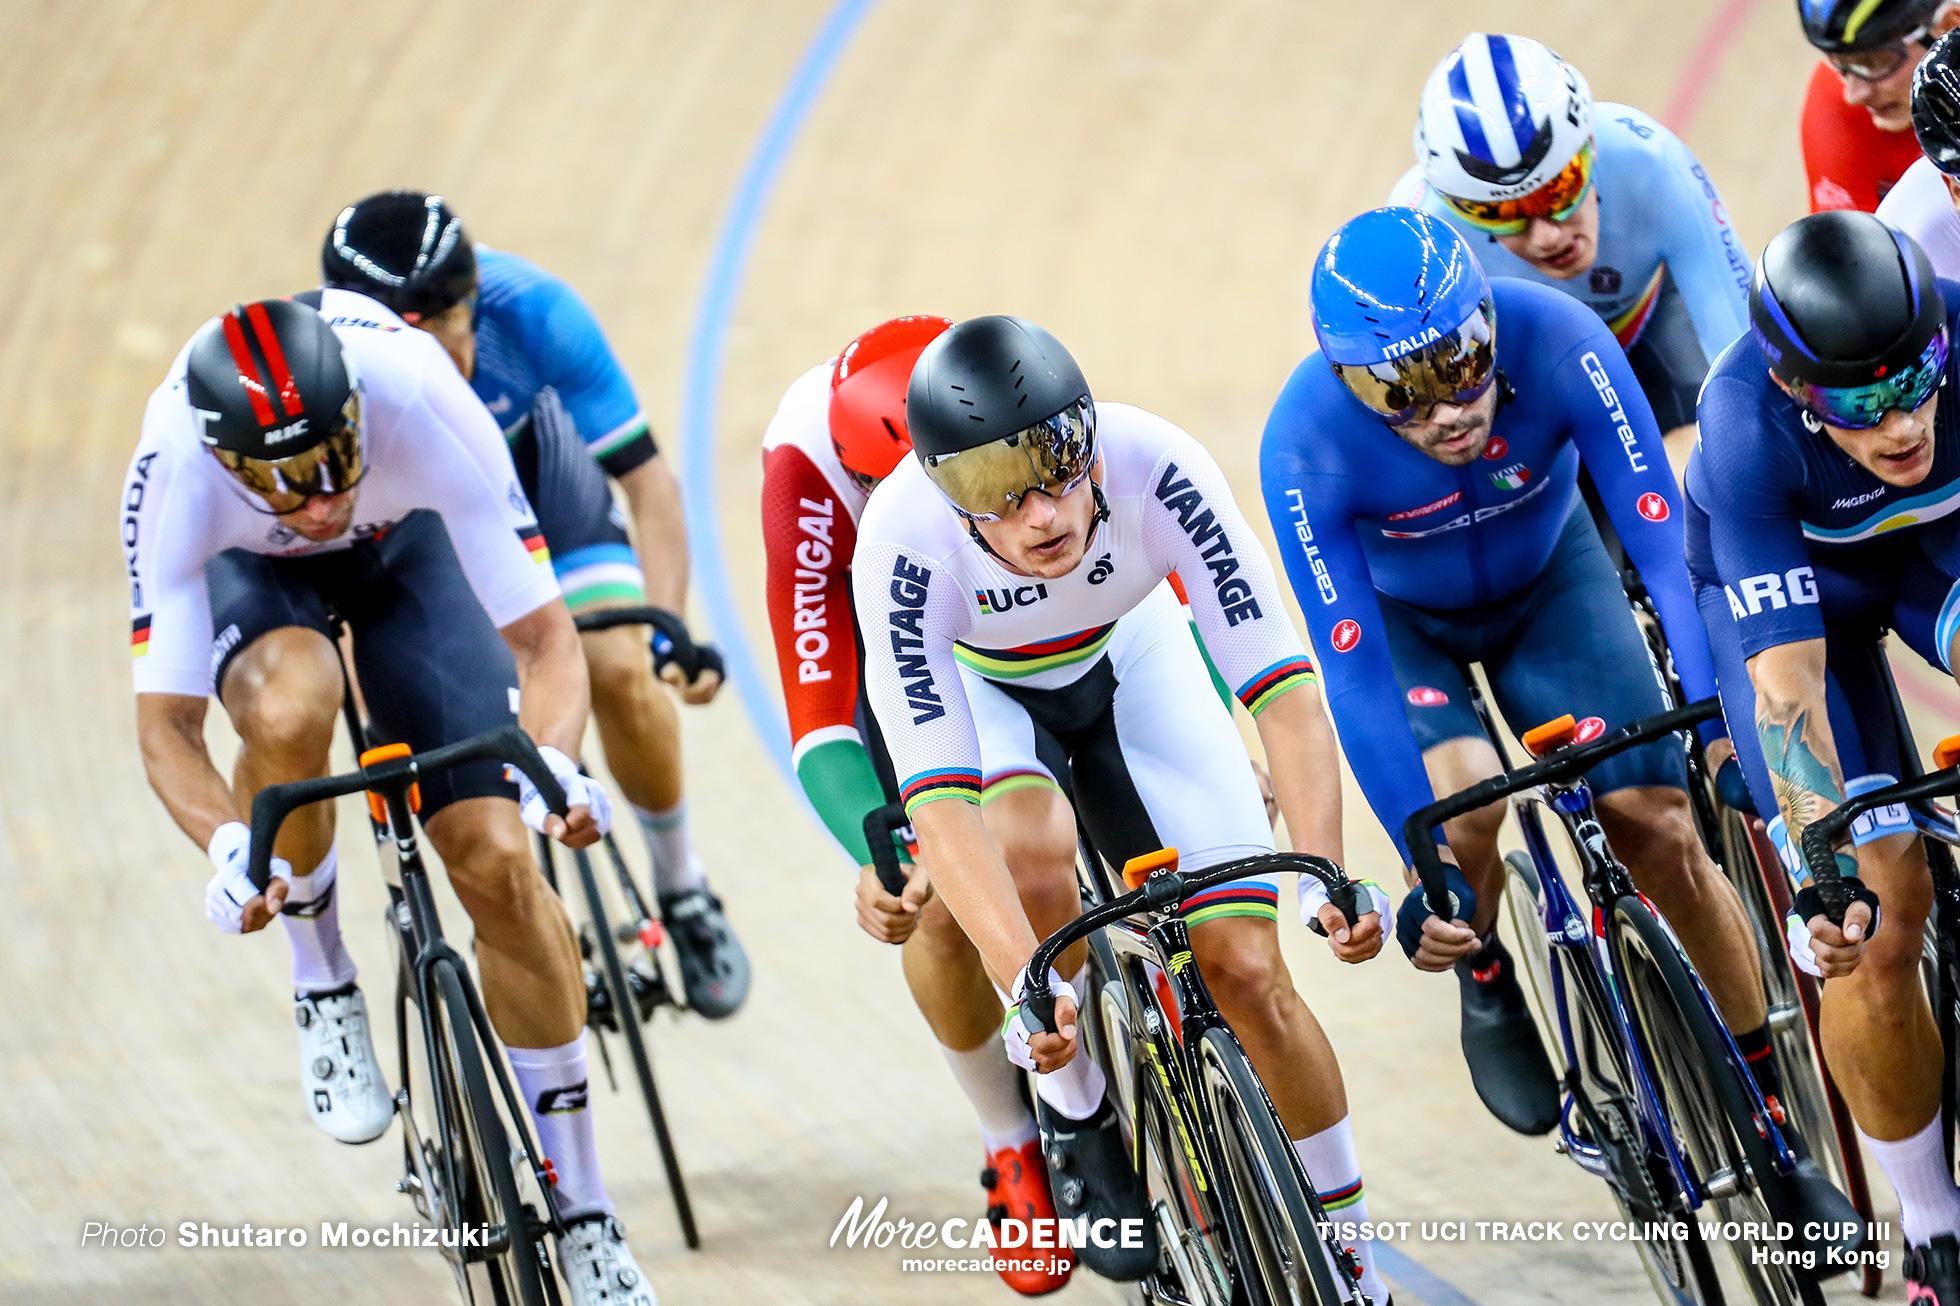 Elimination / Men's Omnium / TISSOT UCI TRACK CYCLING WORLD CUP III, Hong Kong